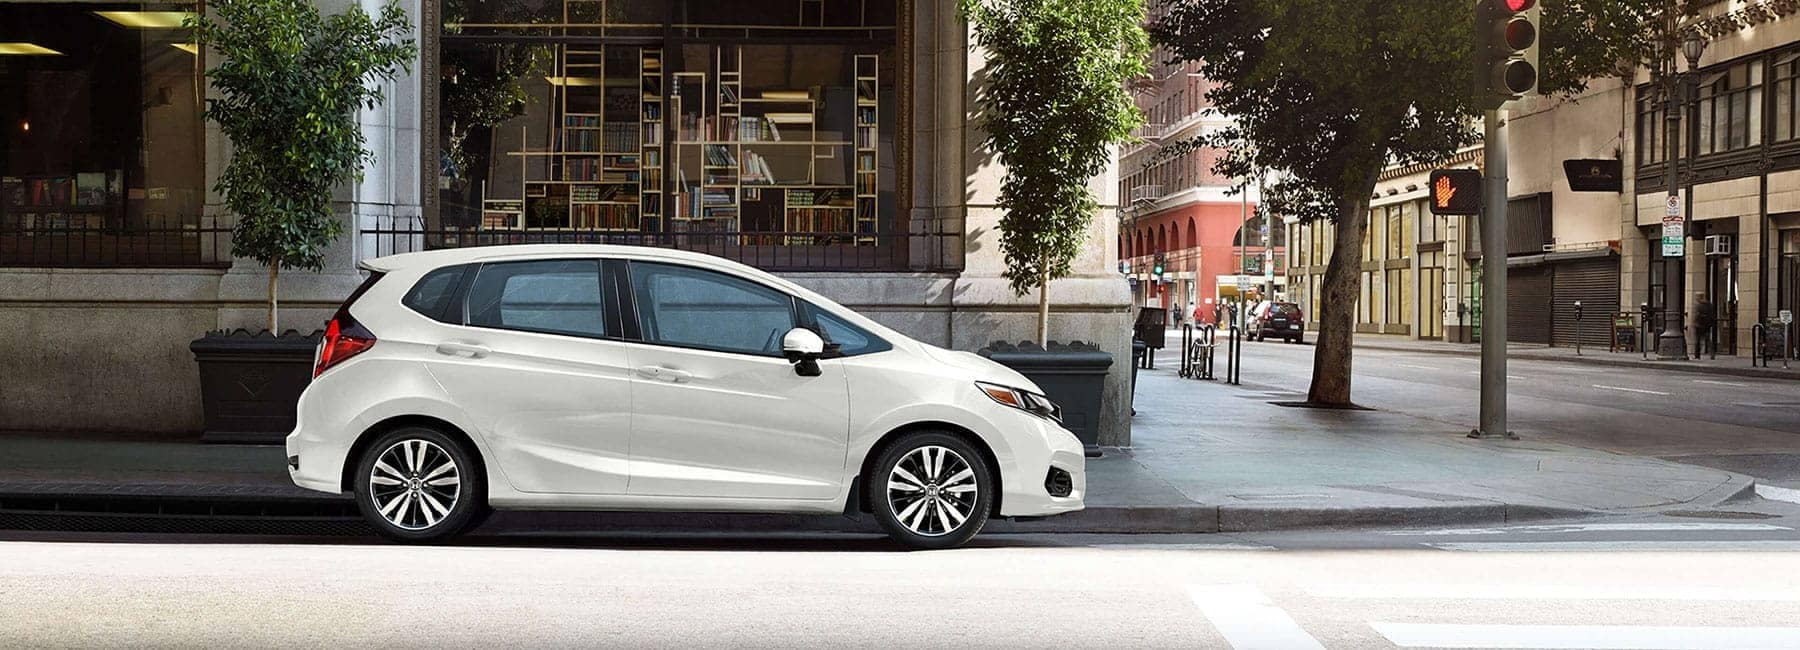 2019 White Honda Fit Parked